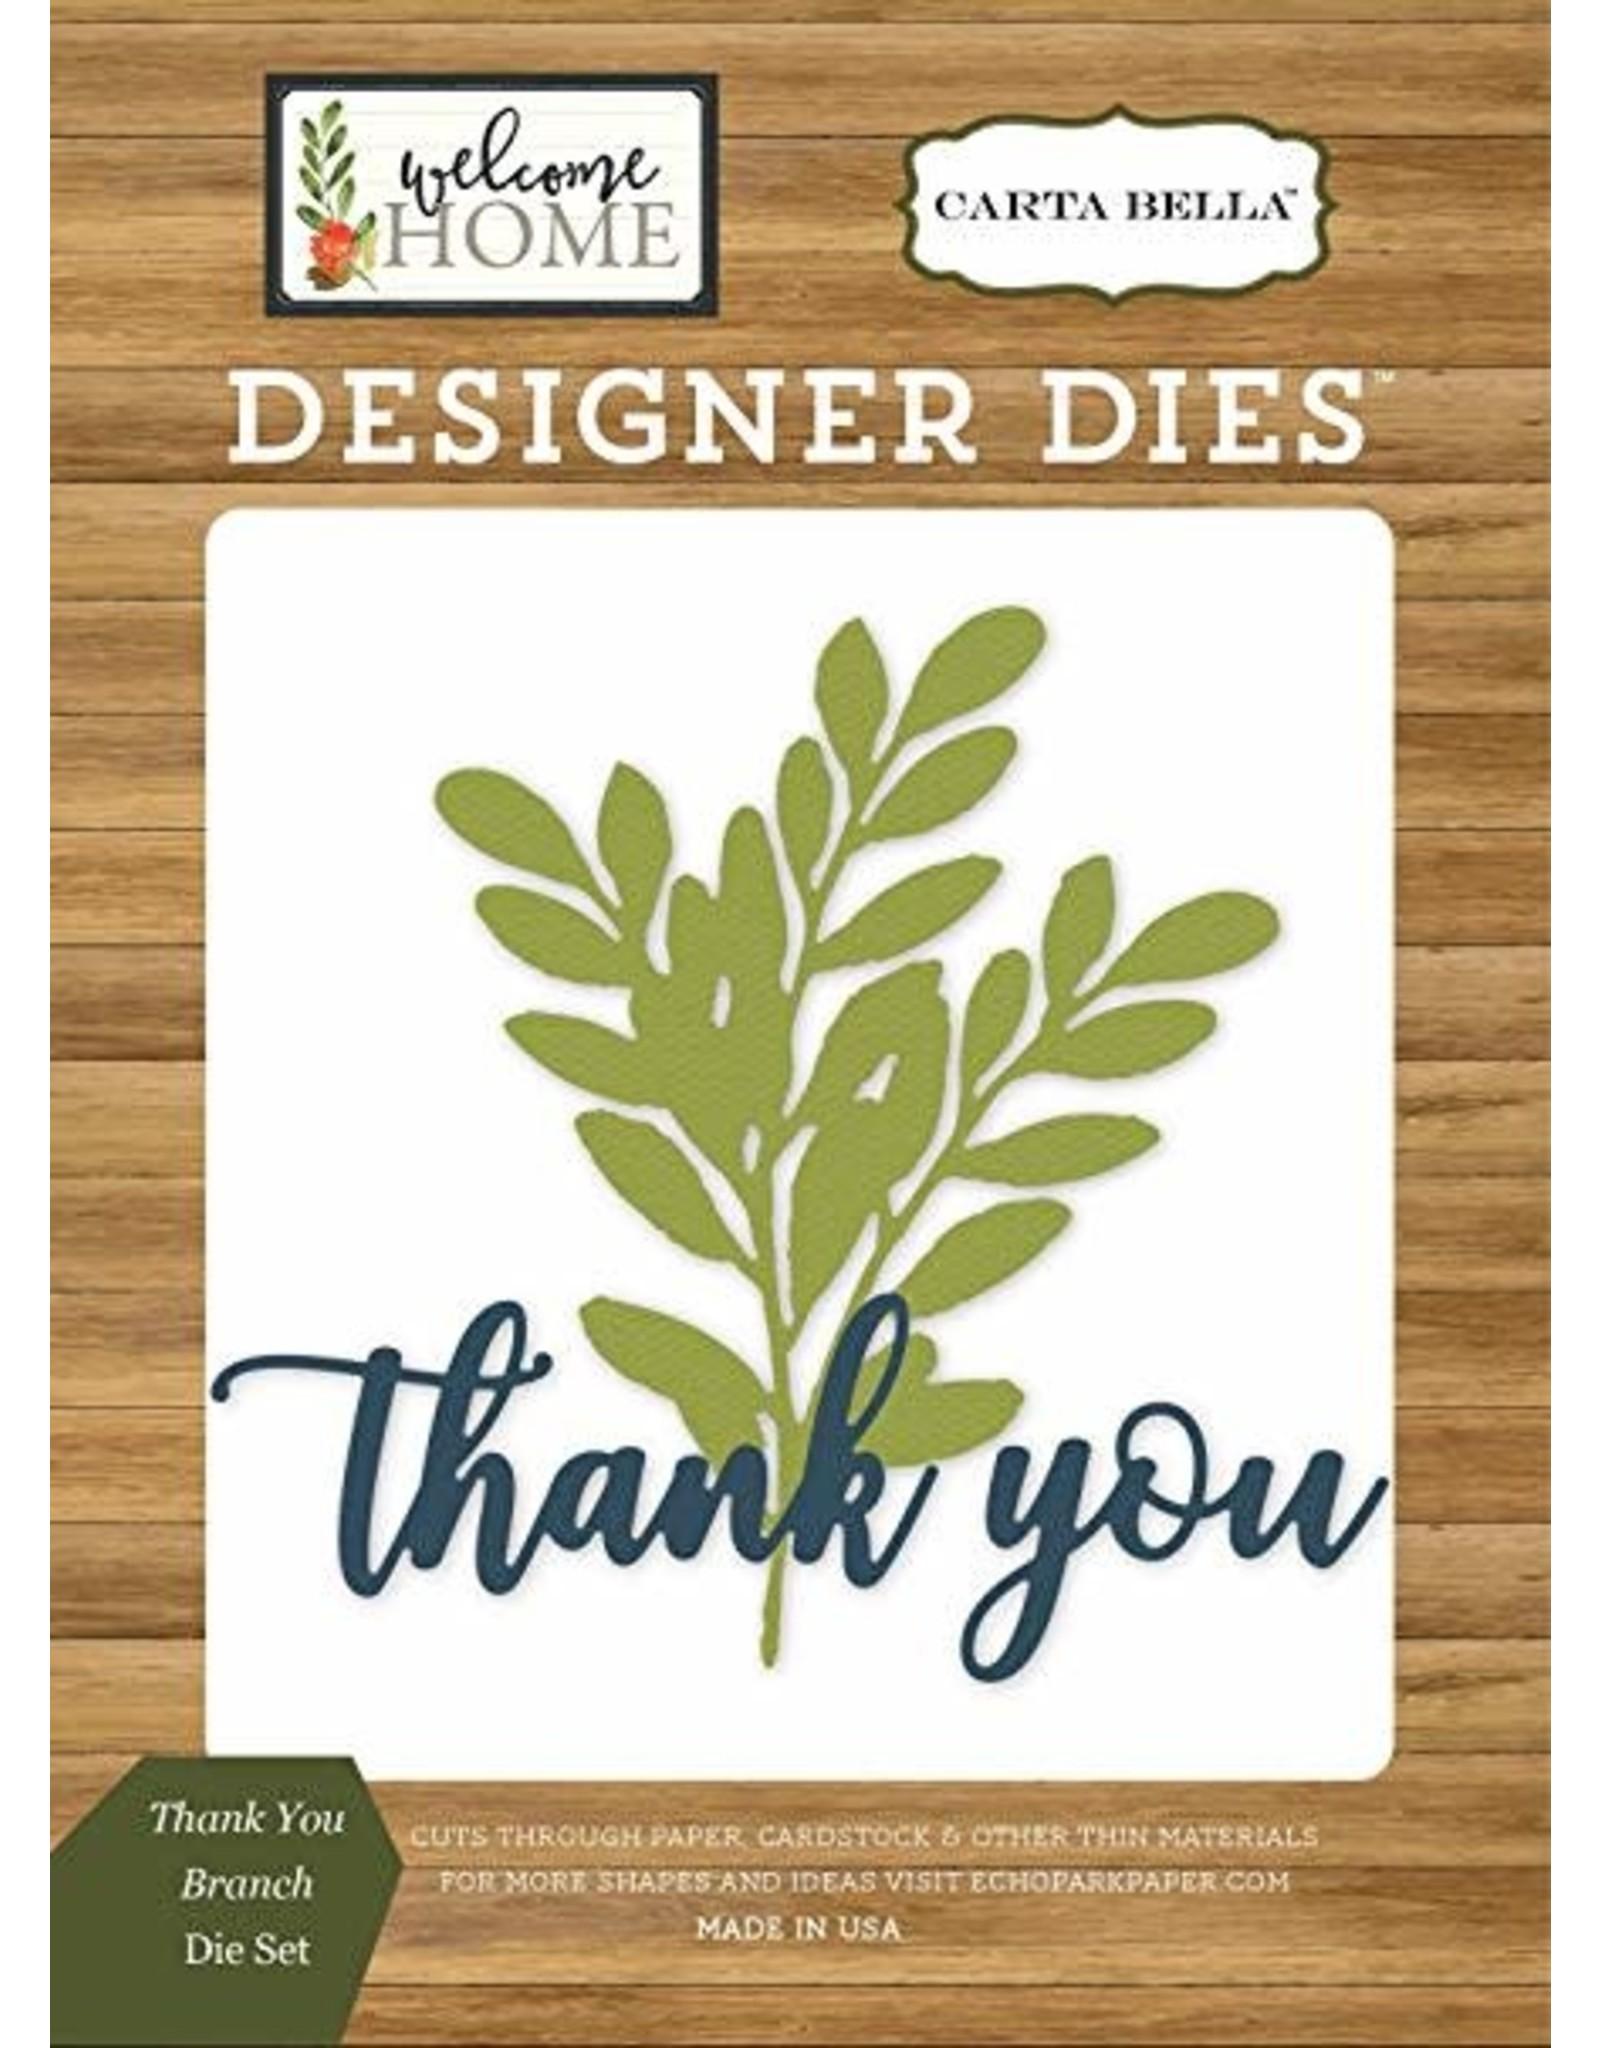 Carta Bella Paper Company, LLC Thank You Branch - Die (40%)